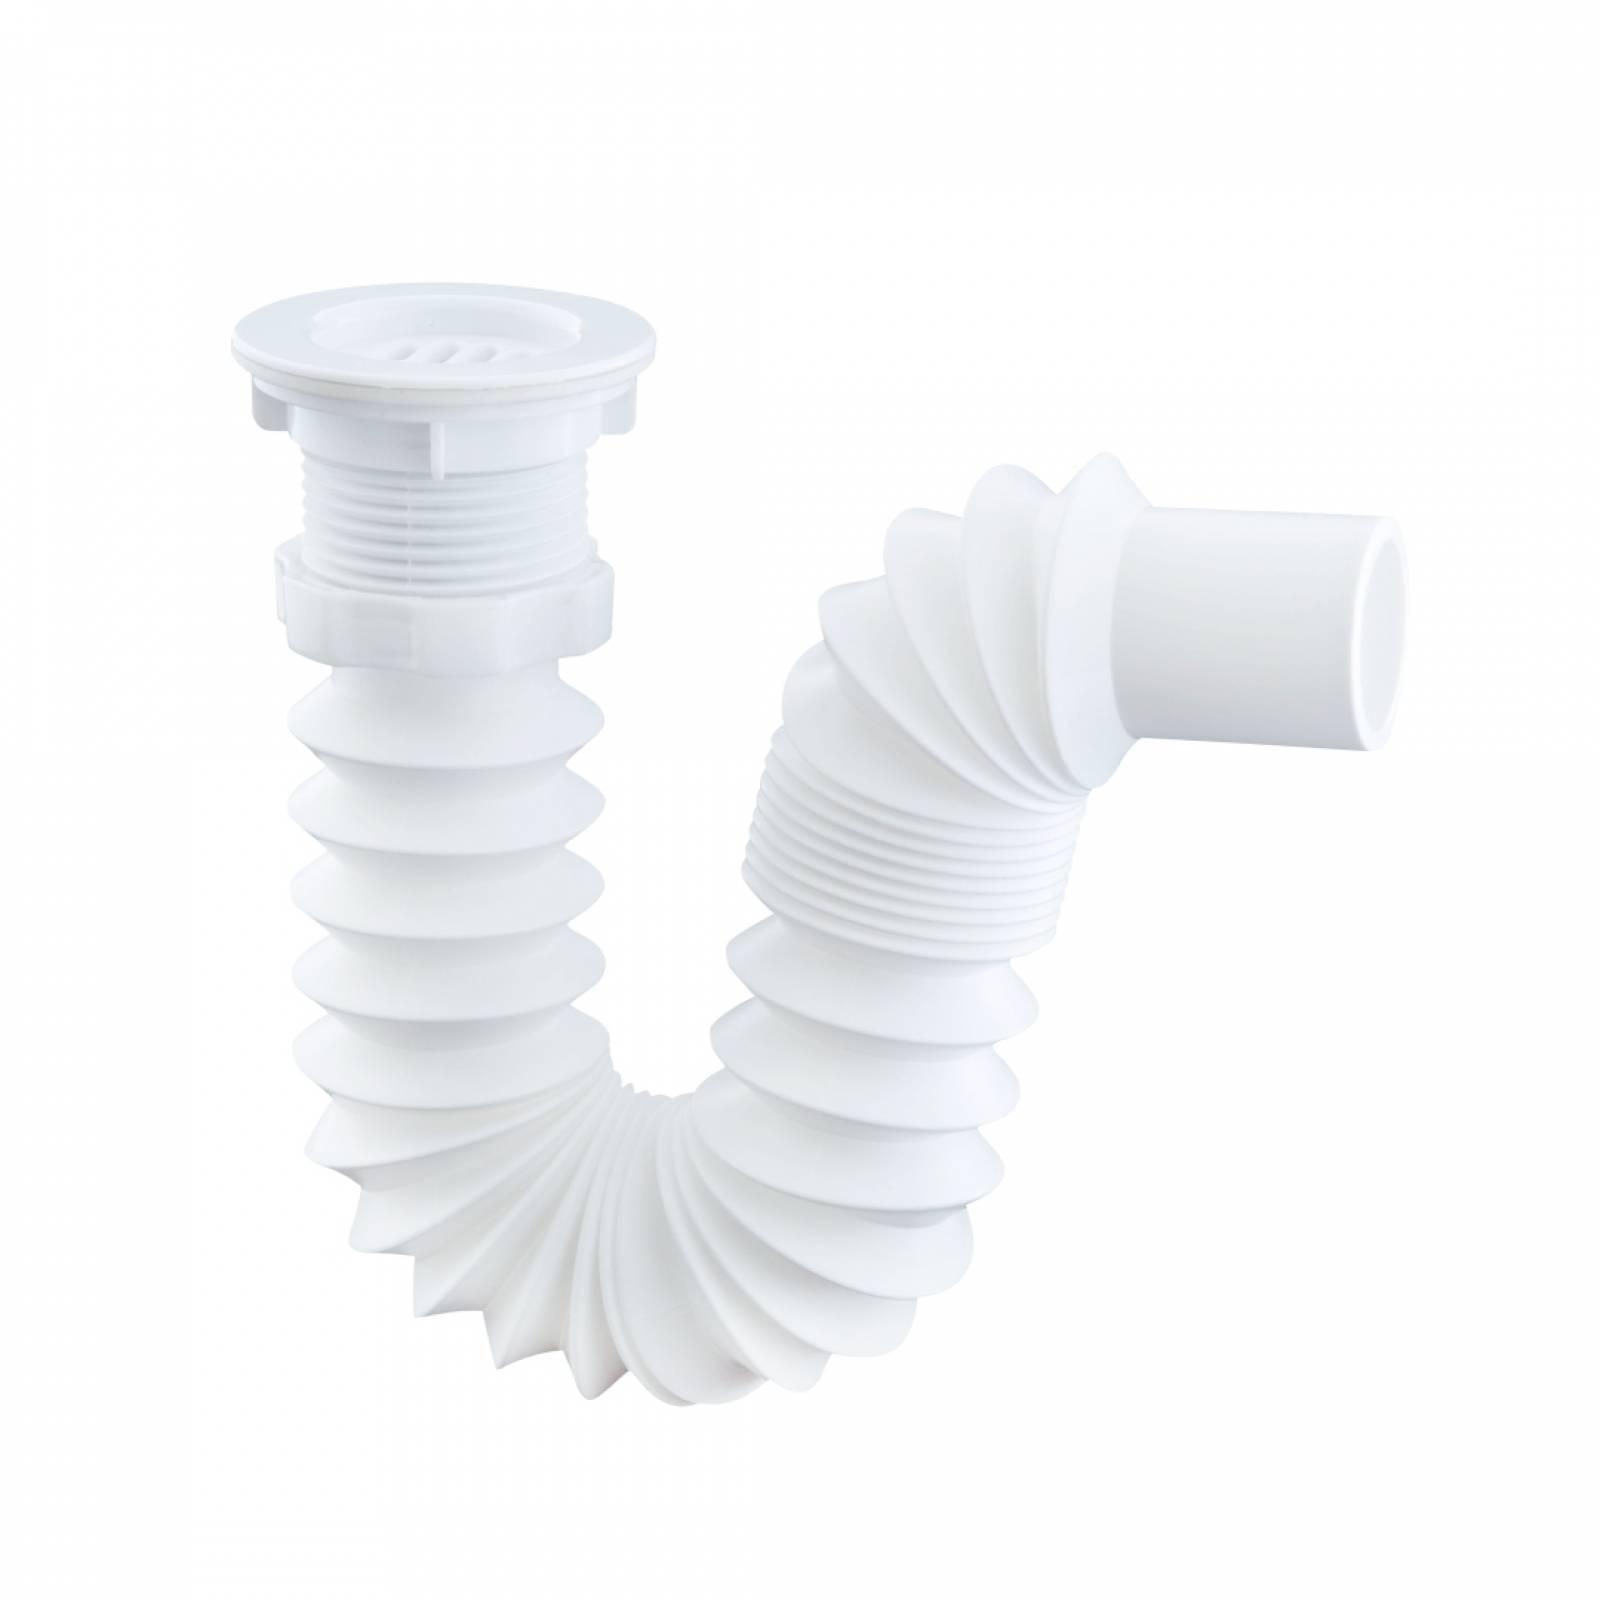 Céspol flexible rejilla plástica 3733 URREA